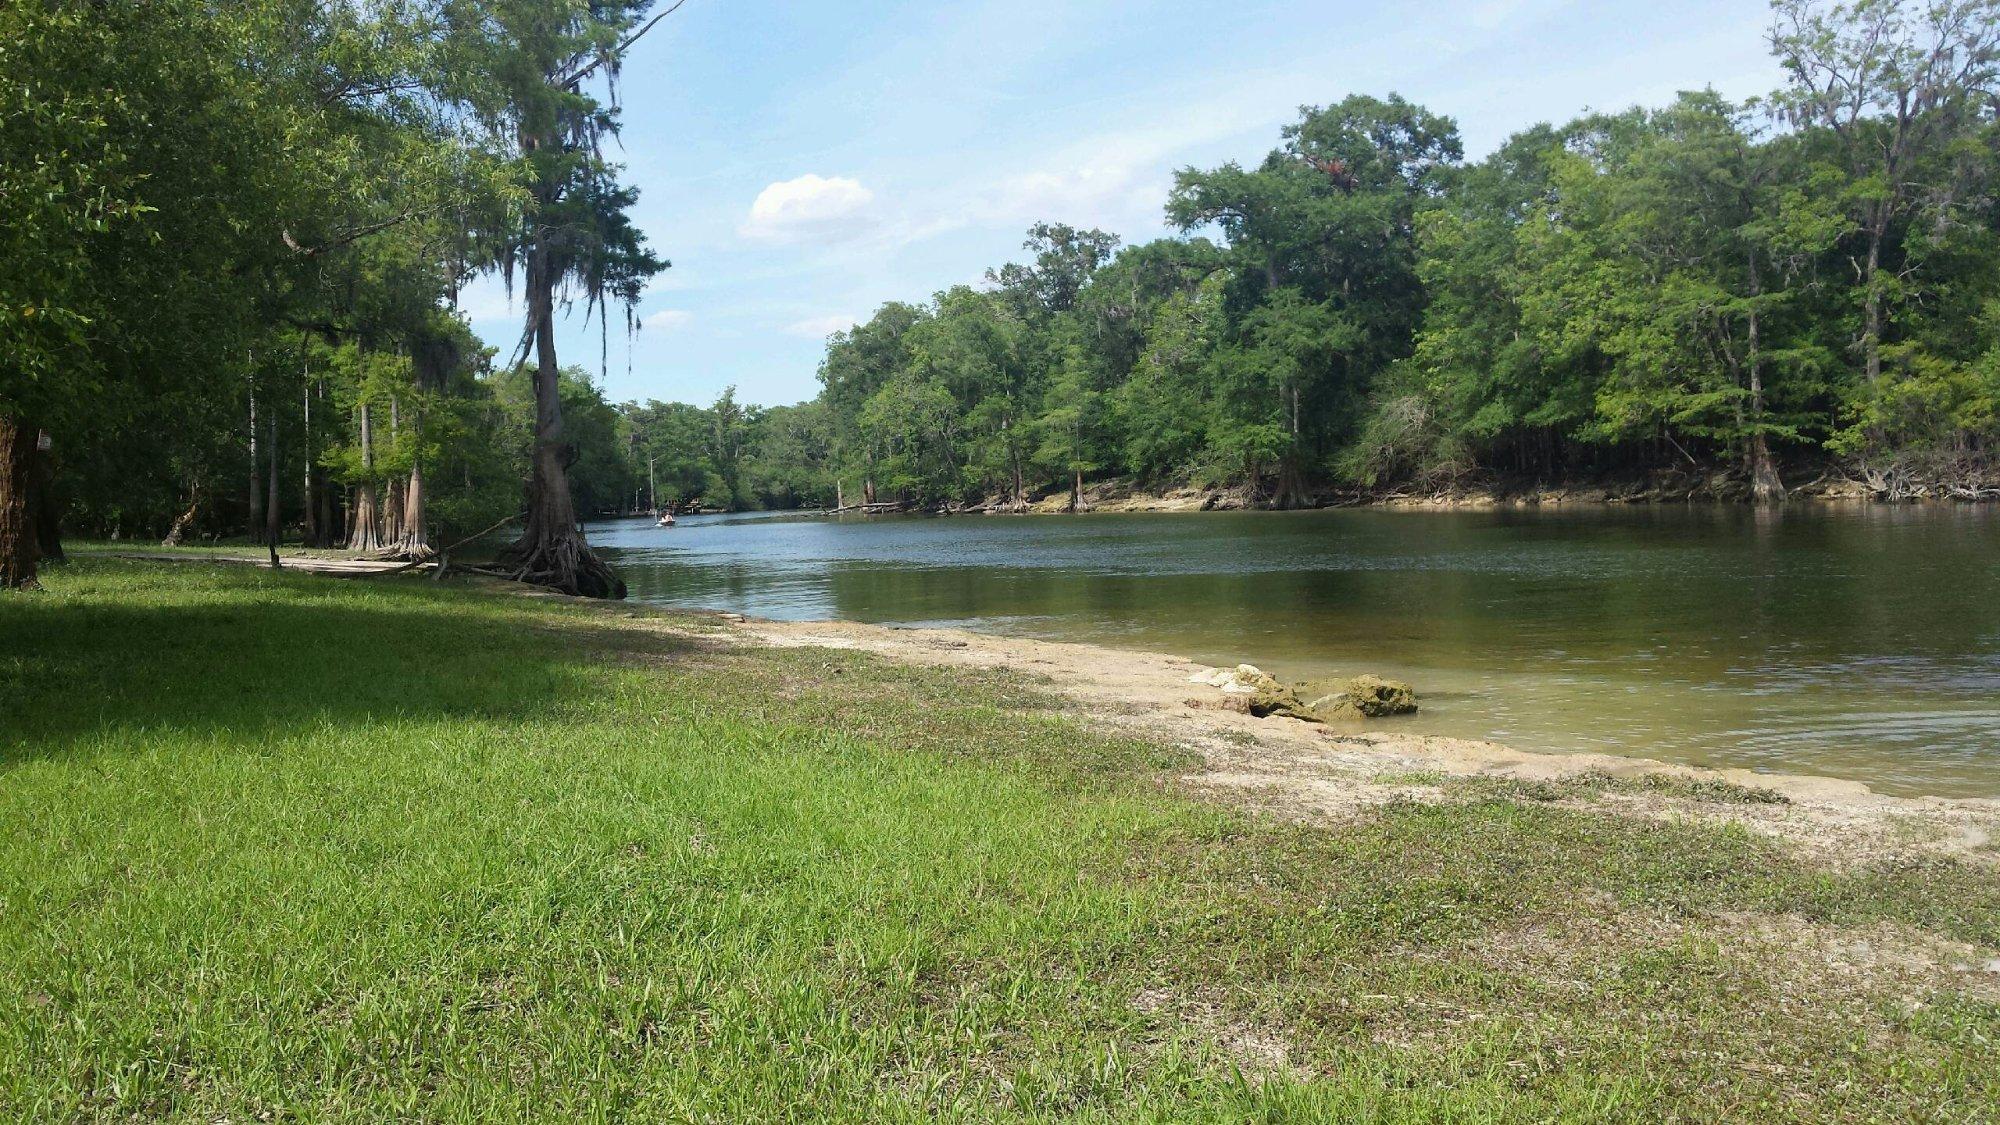 Santa Fe River, Suwanee county Florida